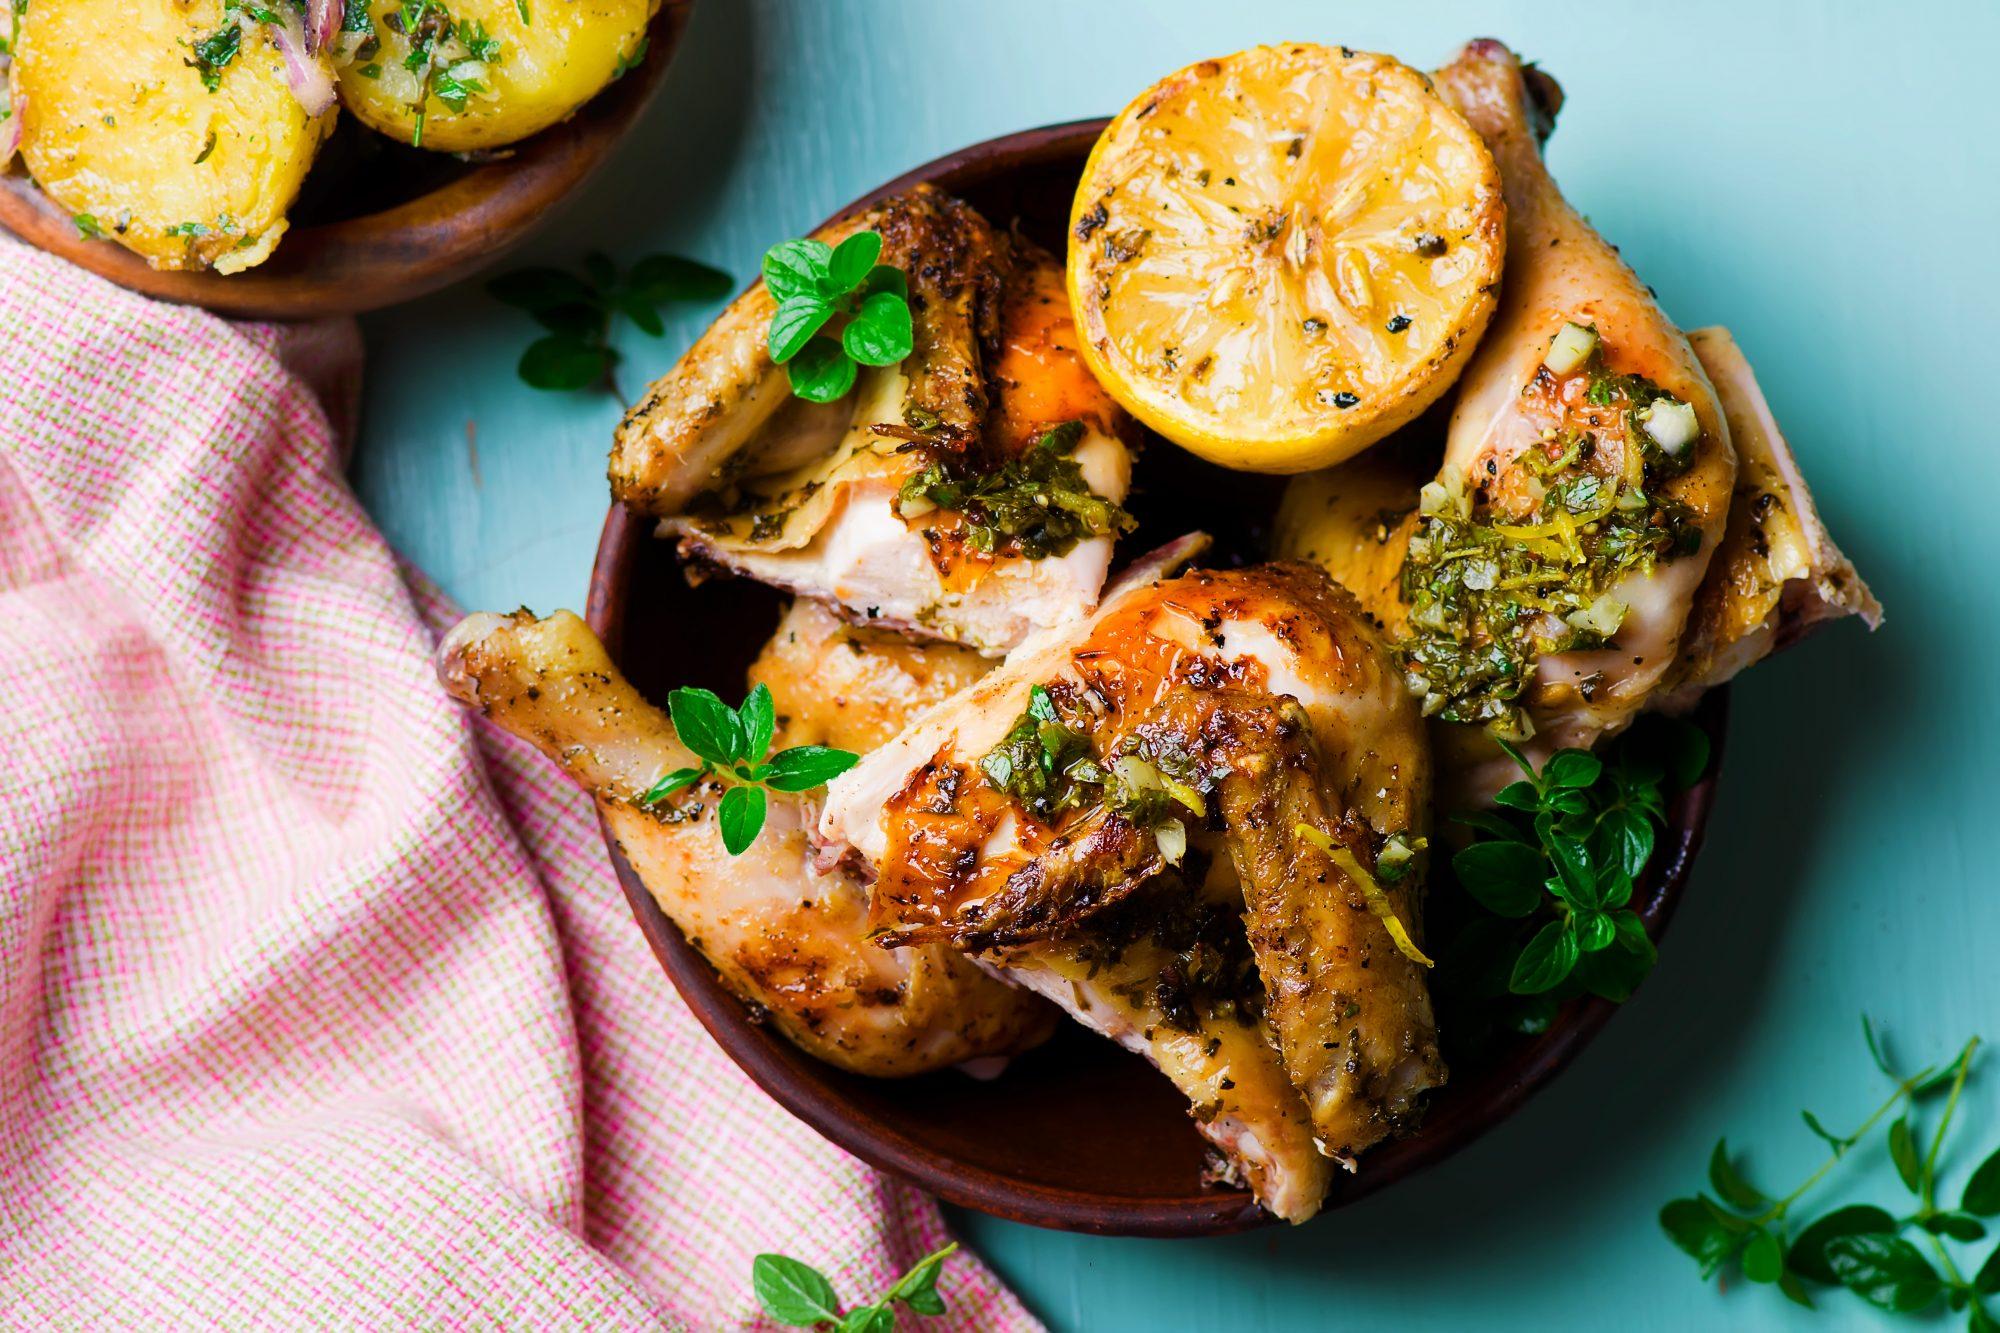 Pollo con limon y oregano estilo mediterraneo